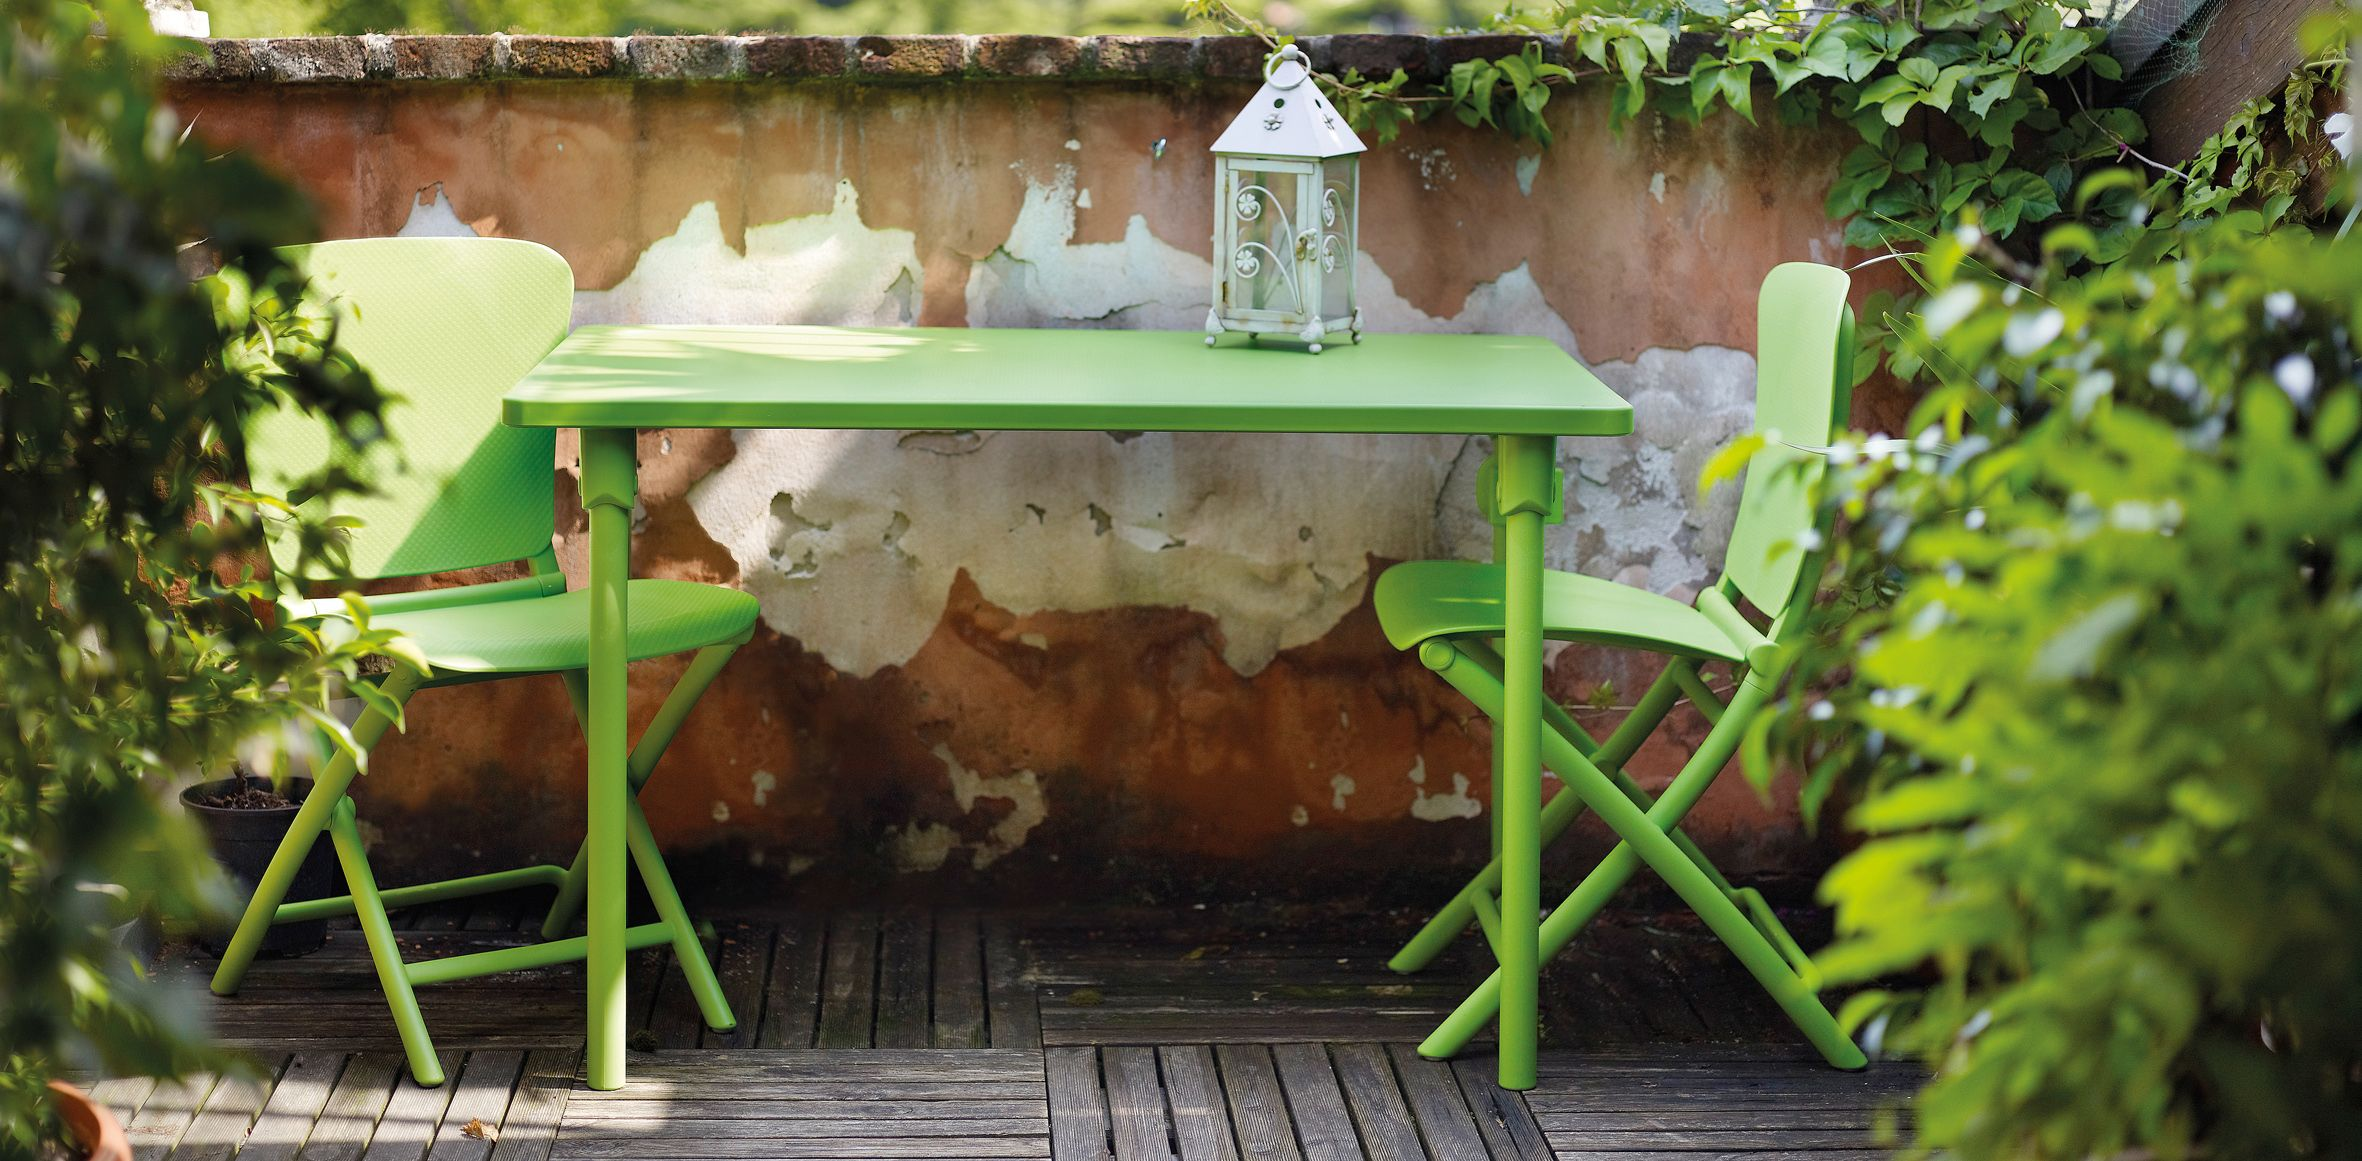 936be9471ddf5fd266a40a8db28e09d0 Impressionnant De Table Petit Espace Concept